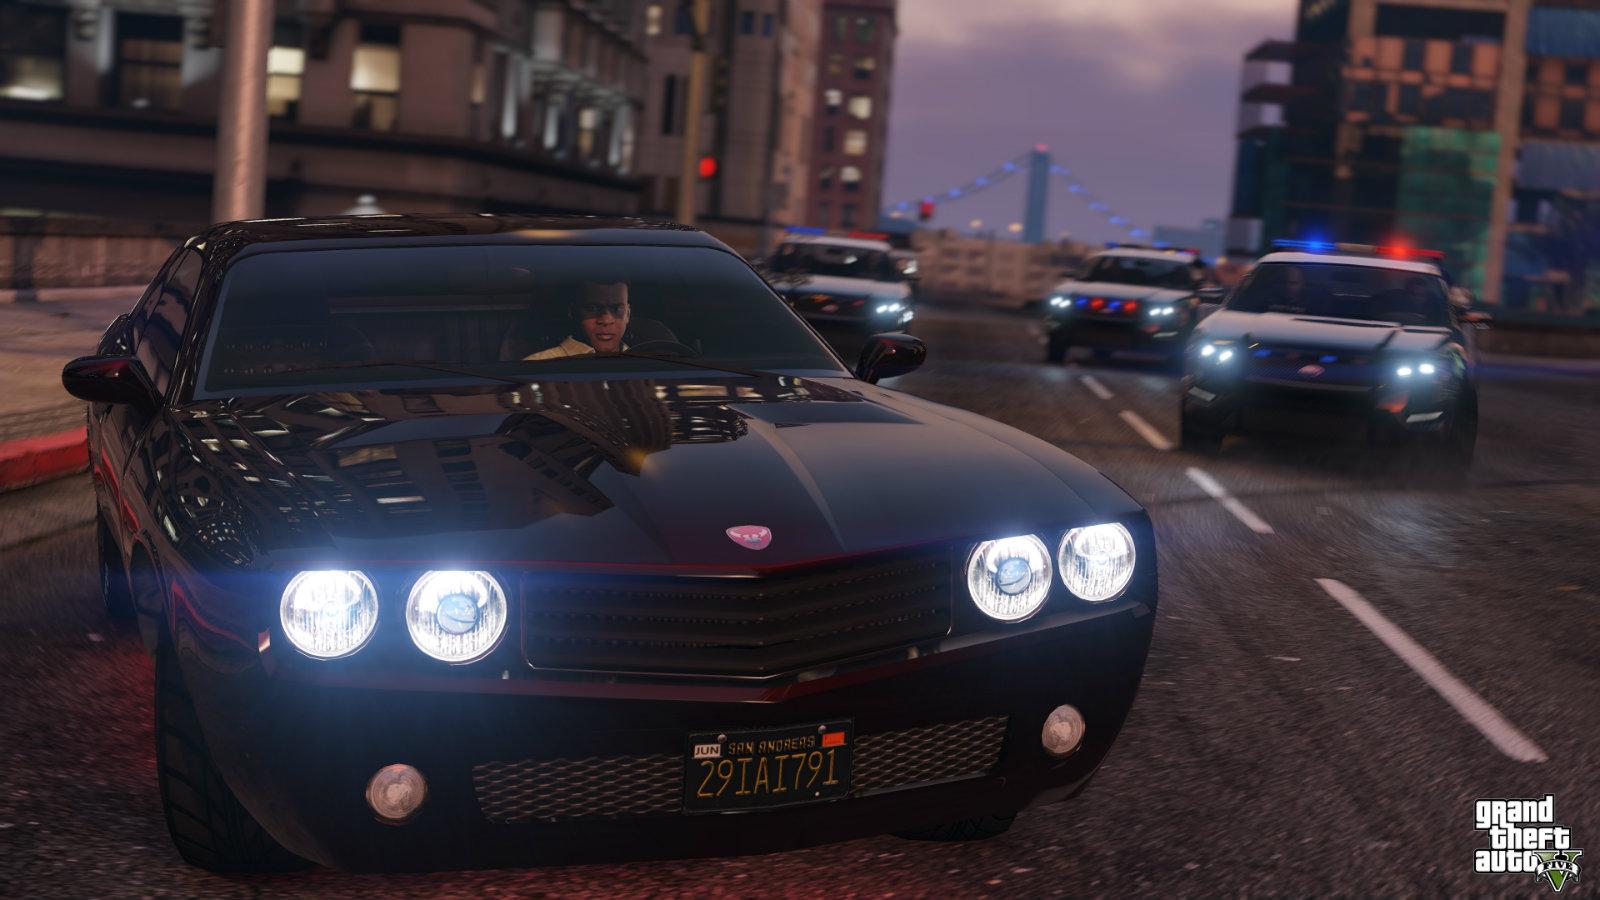 Franklyn speeds away from police in GTA V